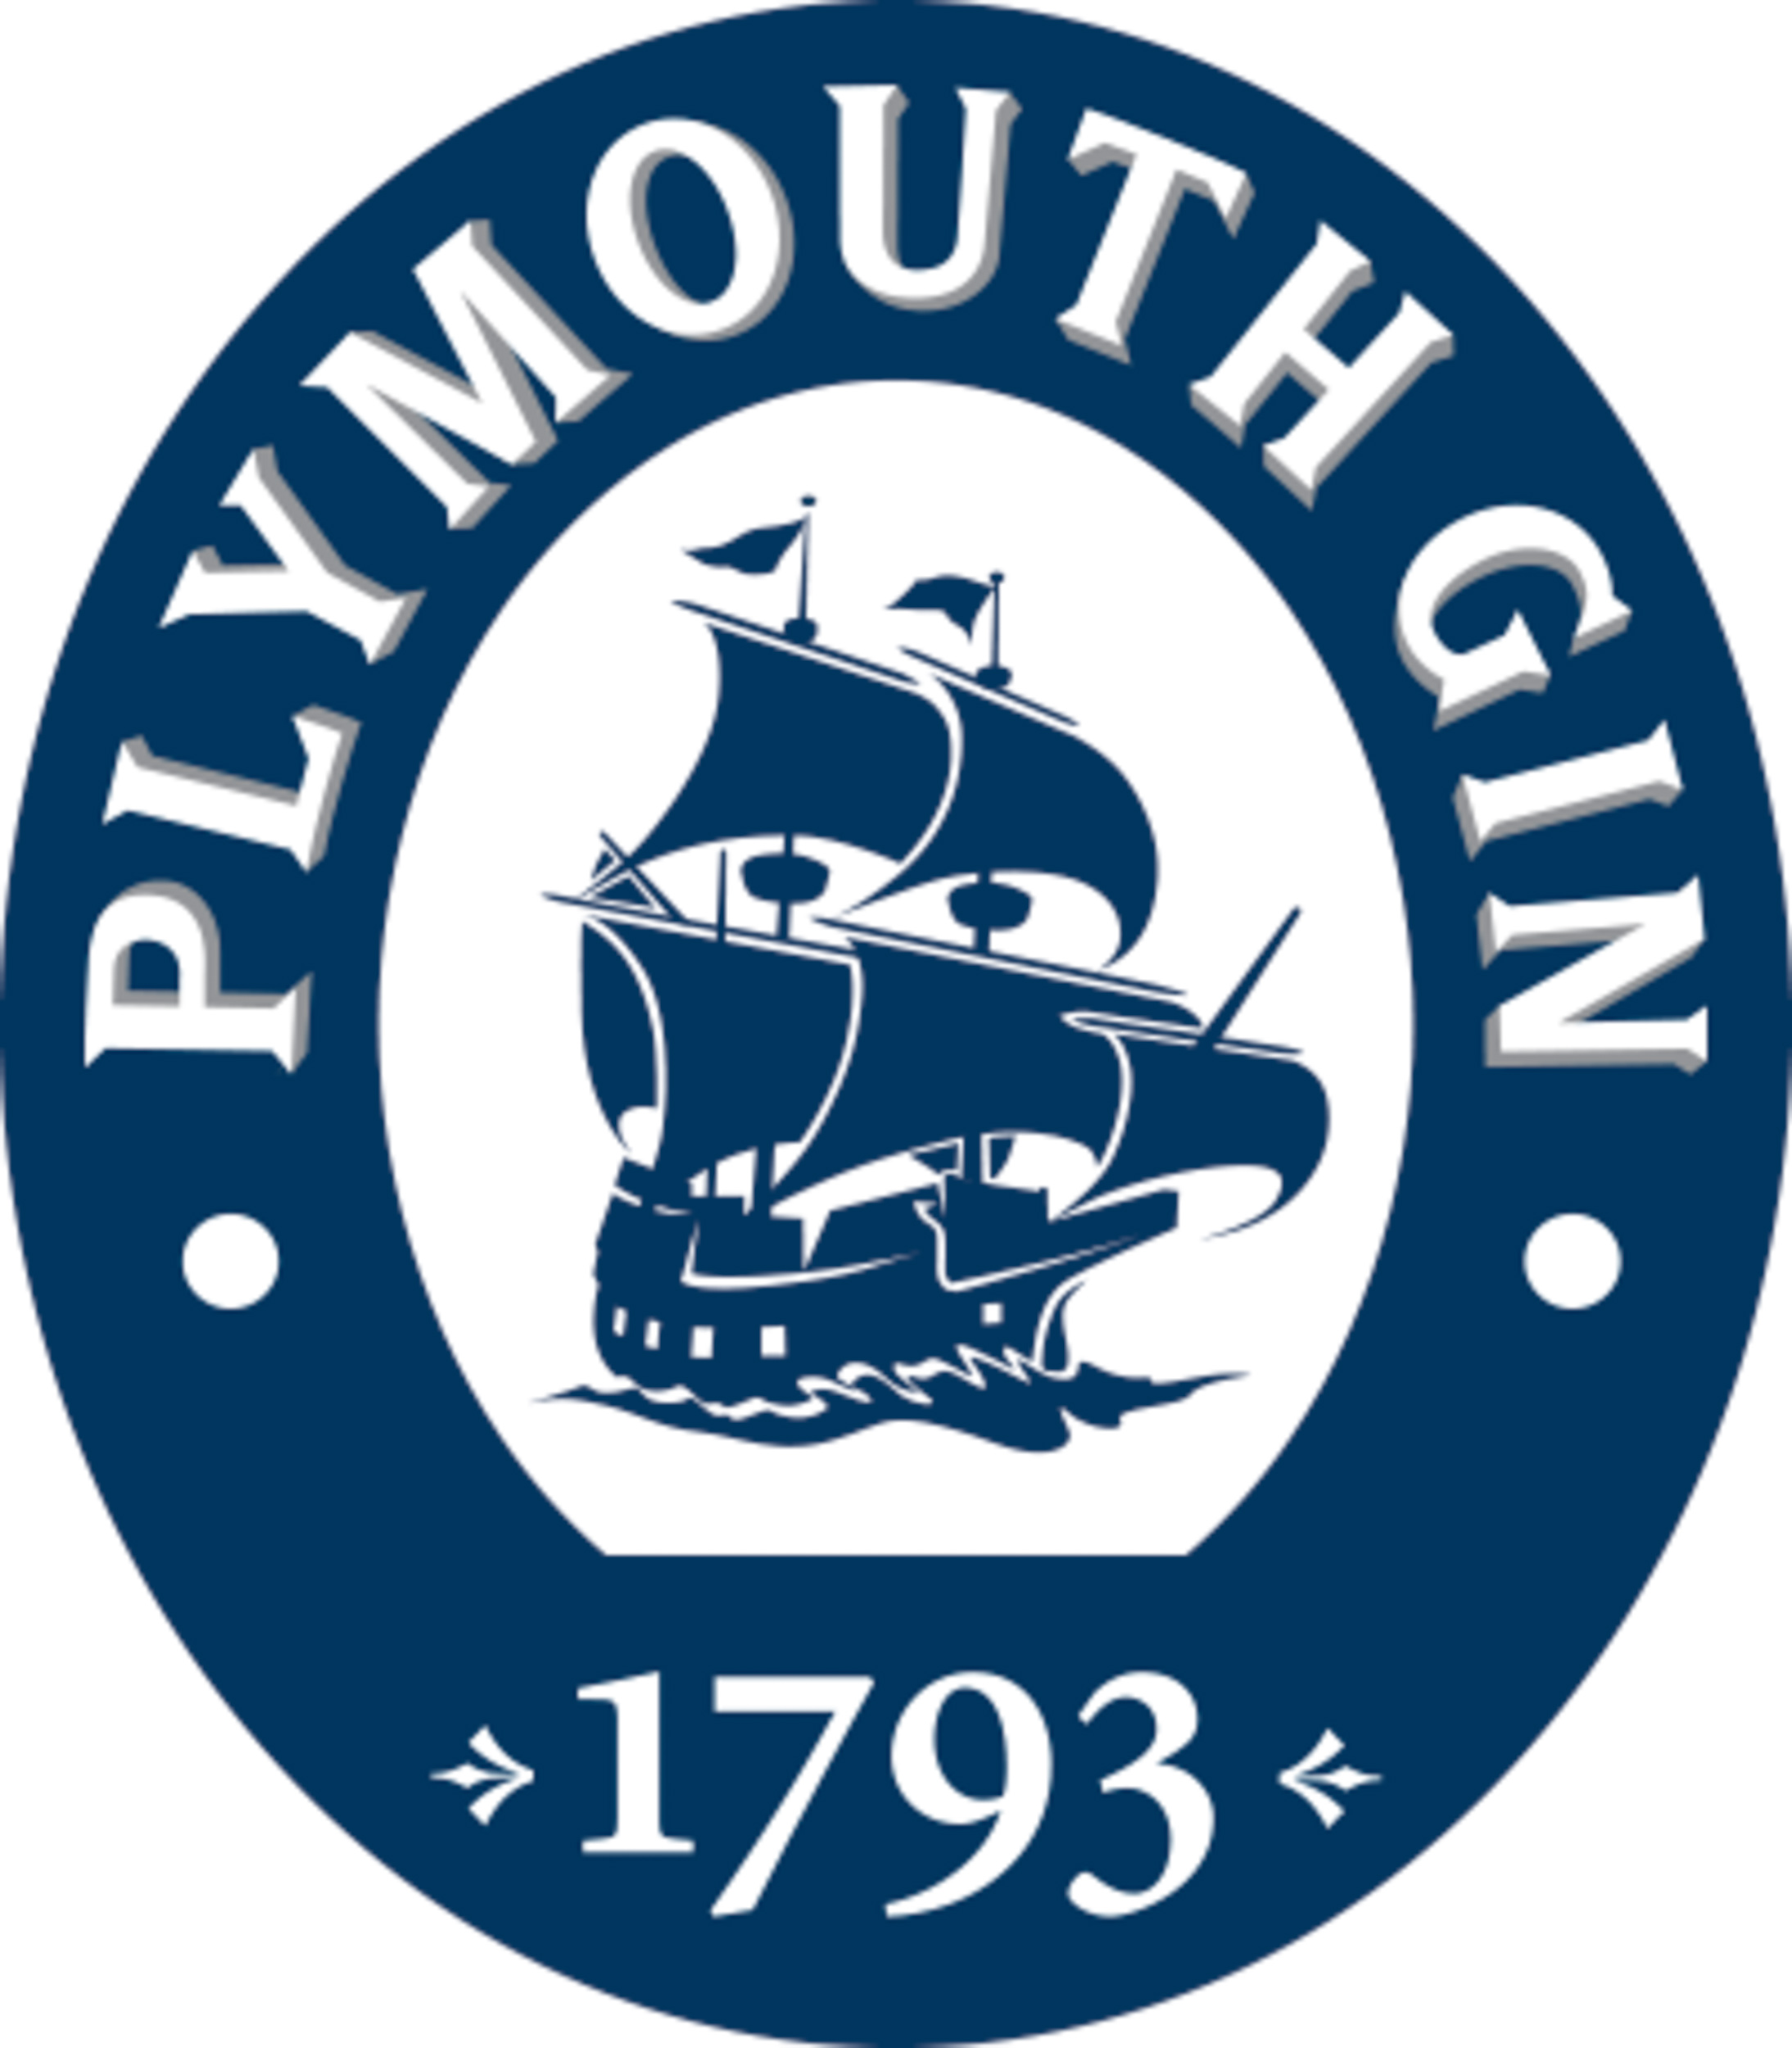 plymouth-gin.jpg